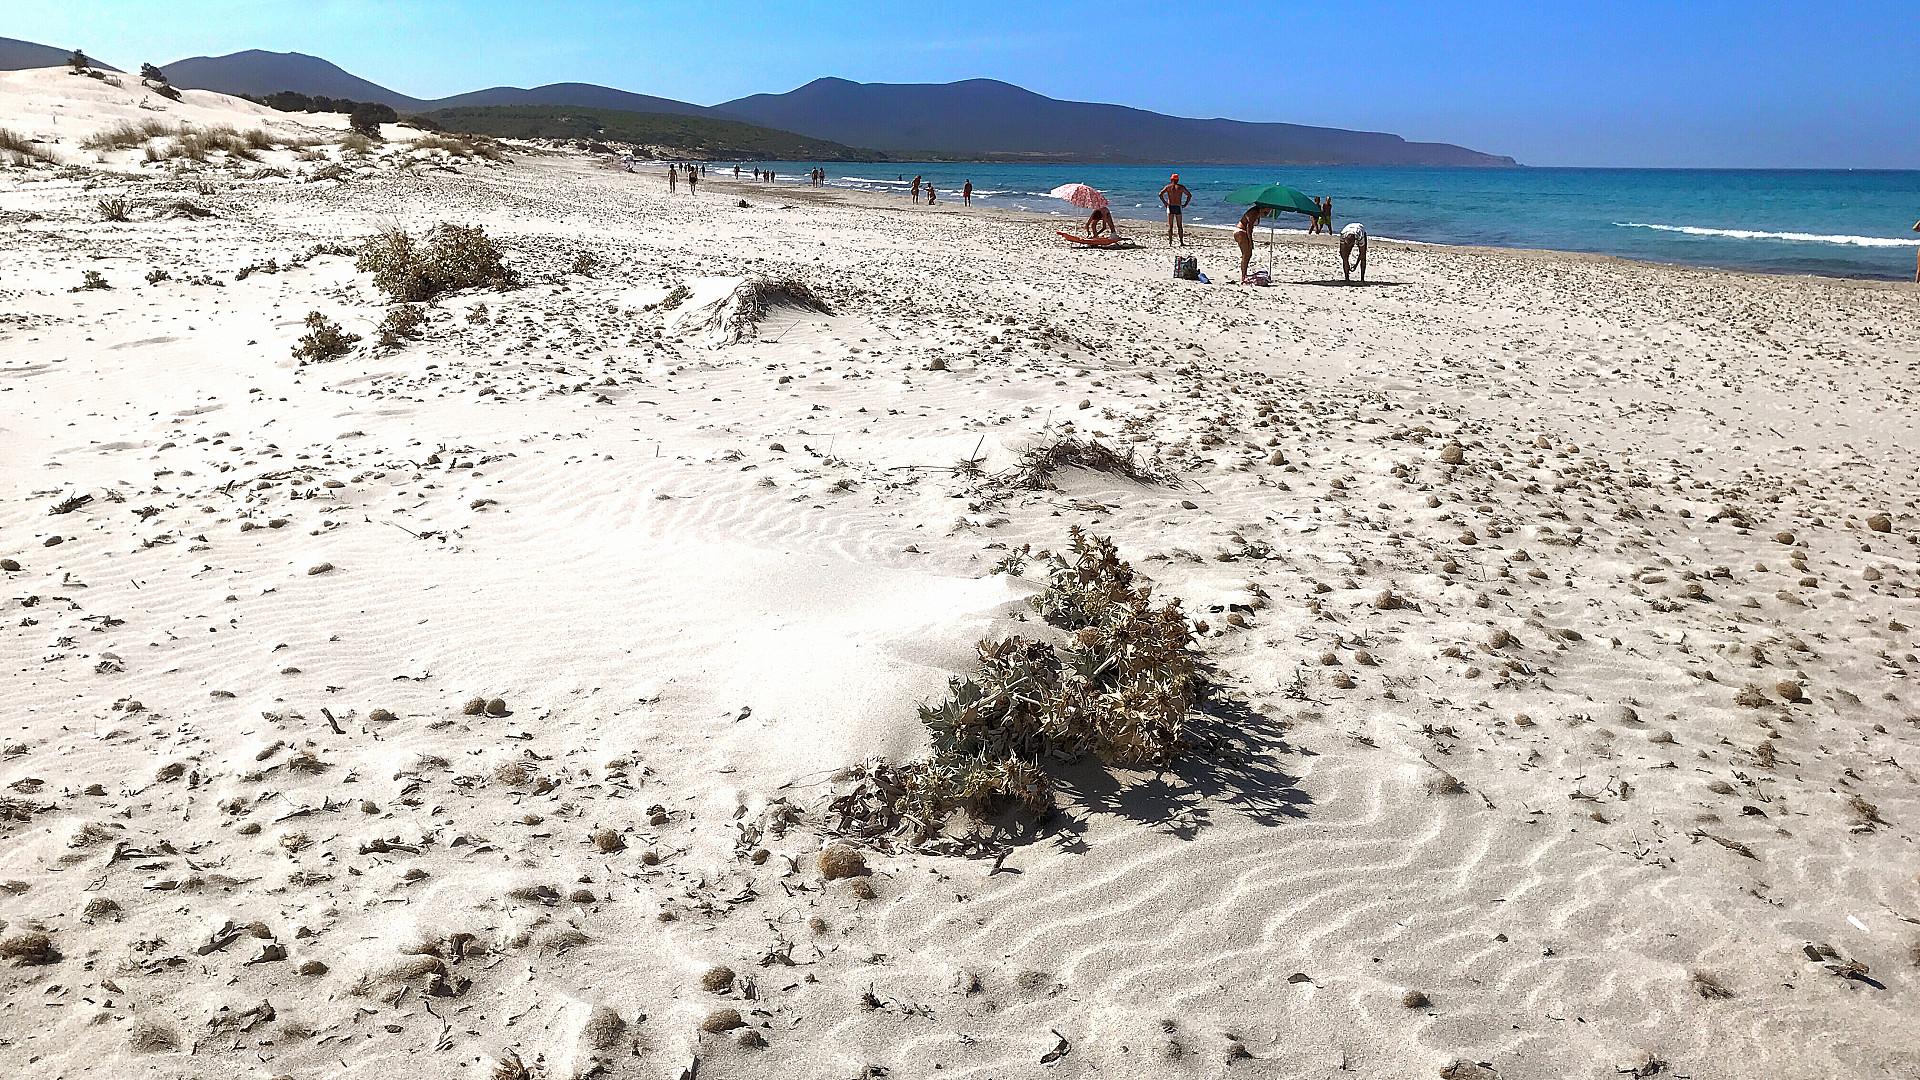 Dune is Arenas Biancas